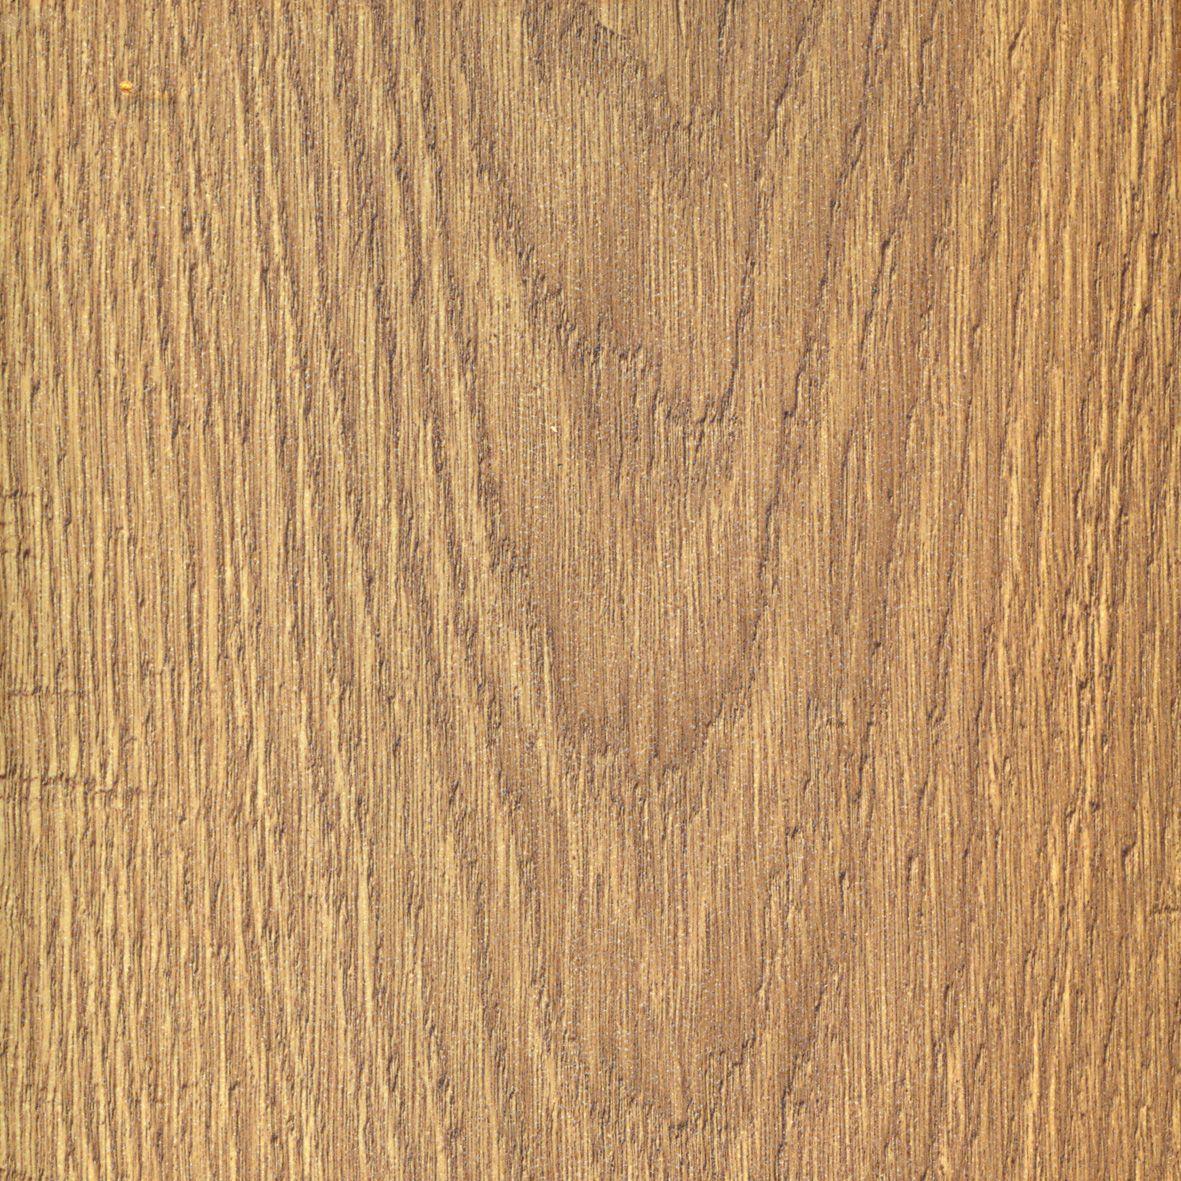 Amadeo oak effect laminate flooring sample m sample for B q laminate flooring